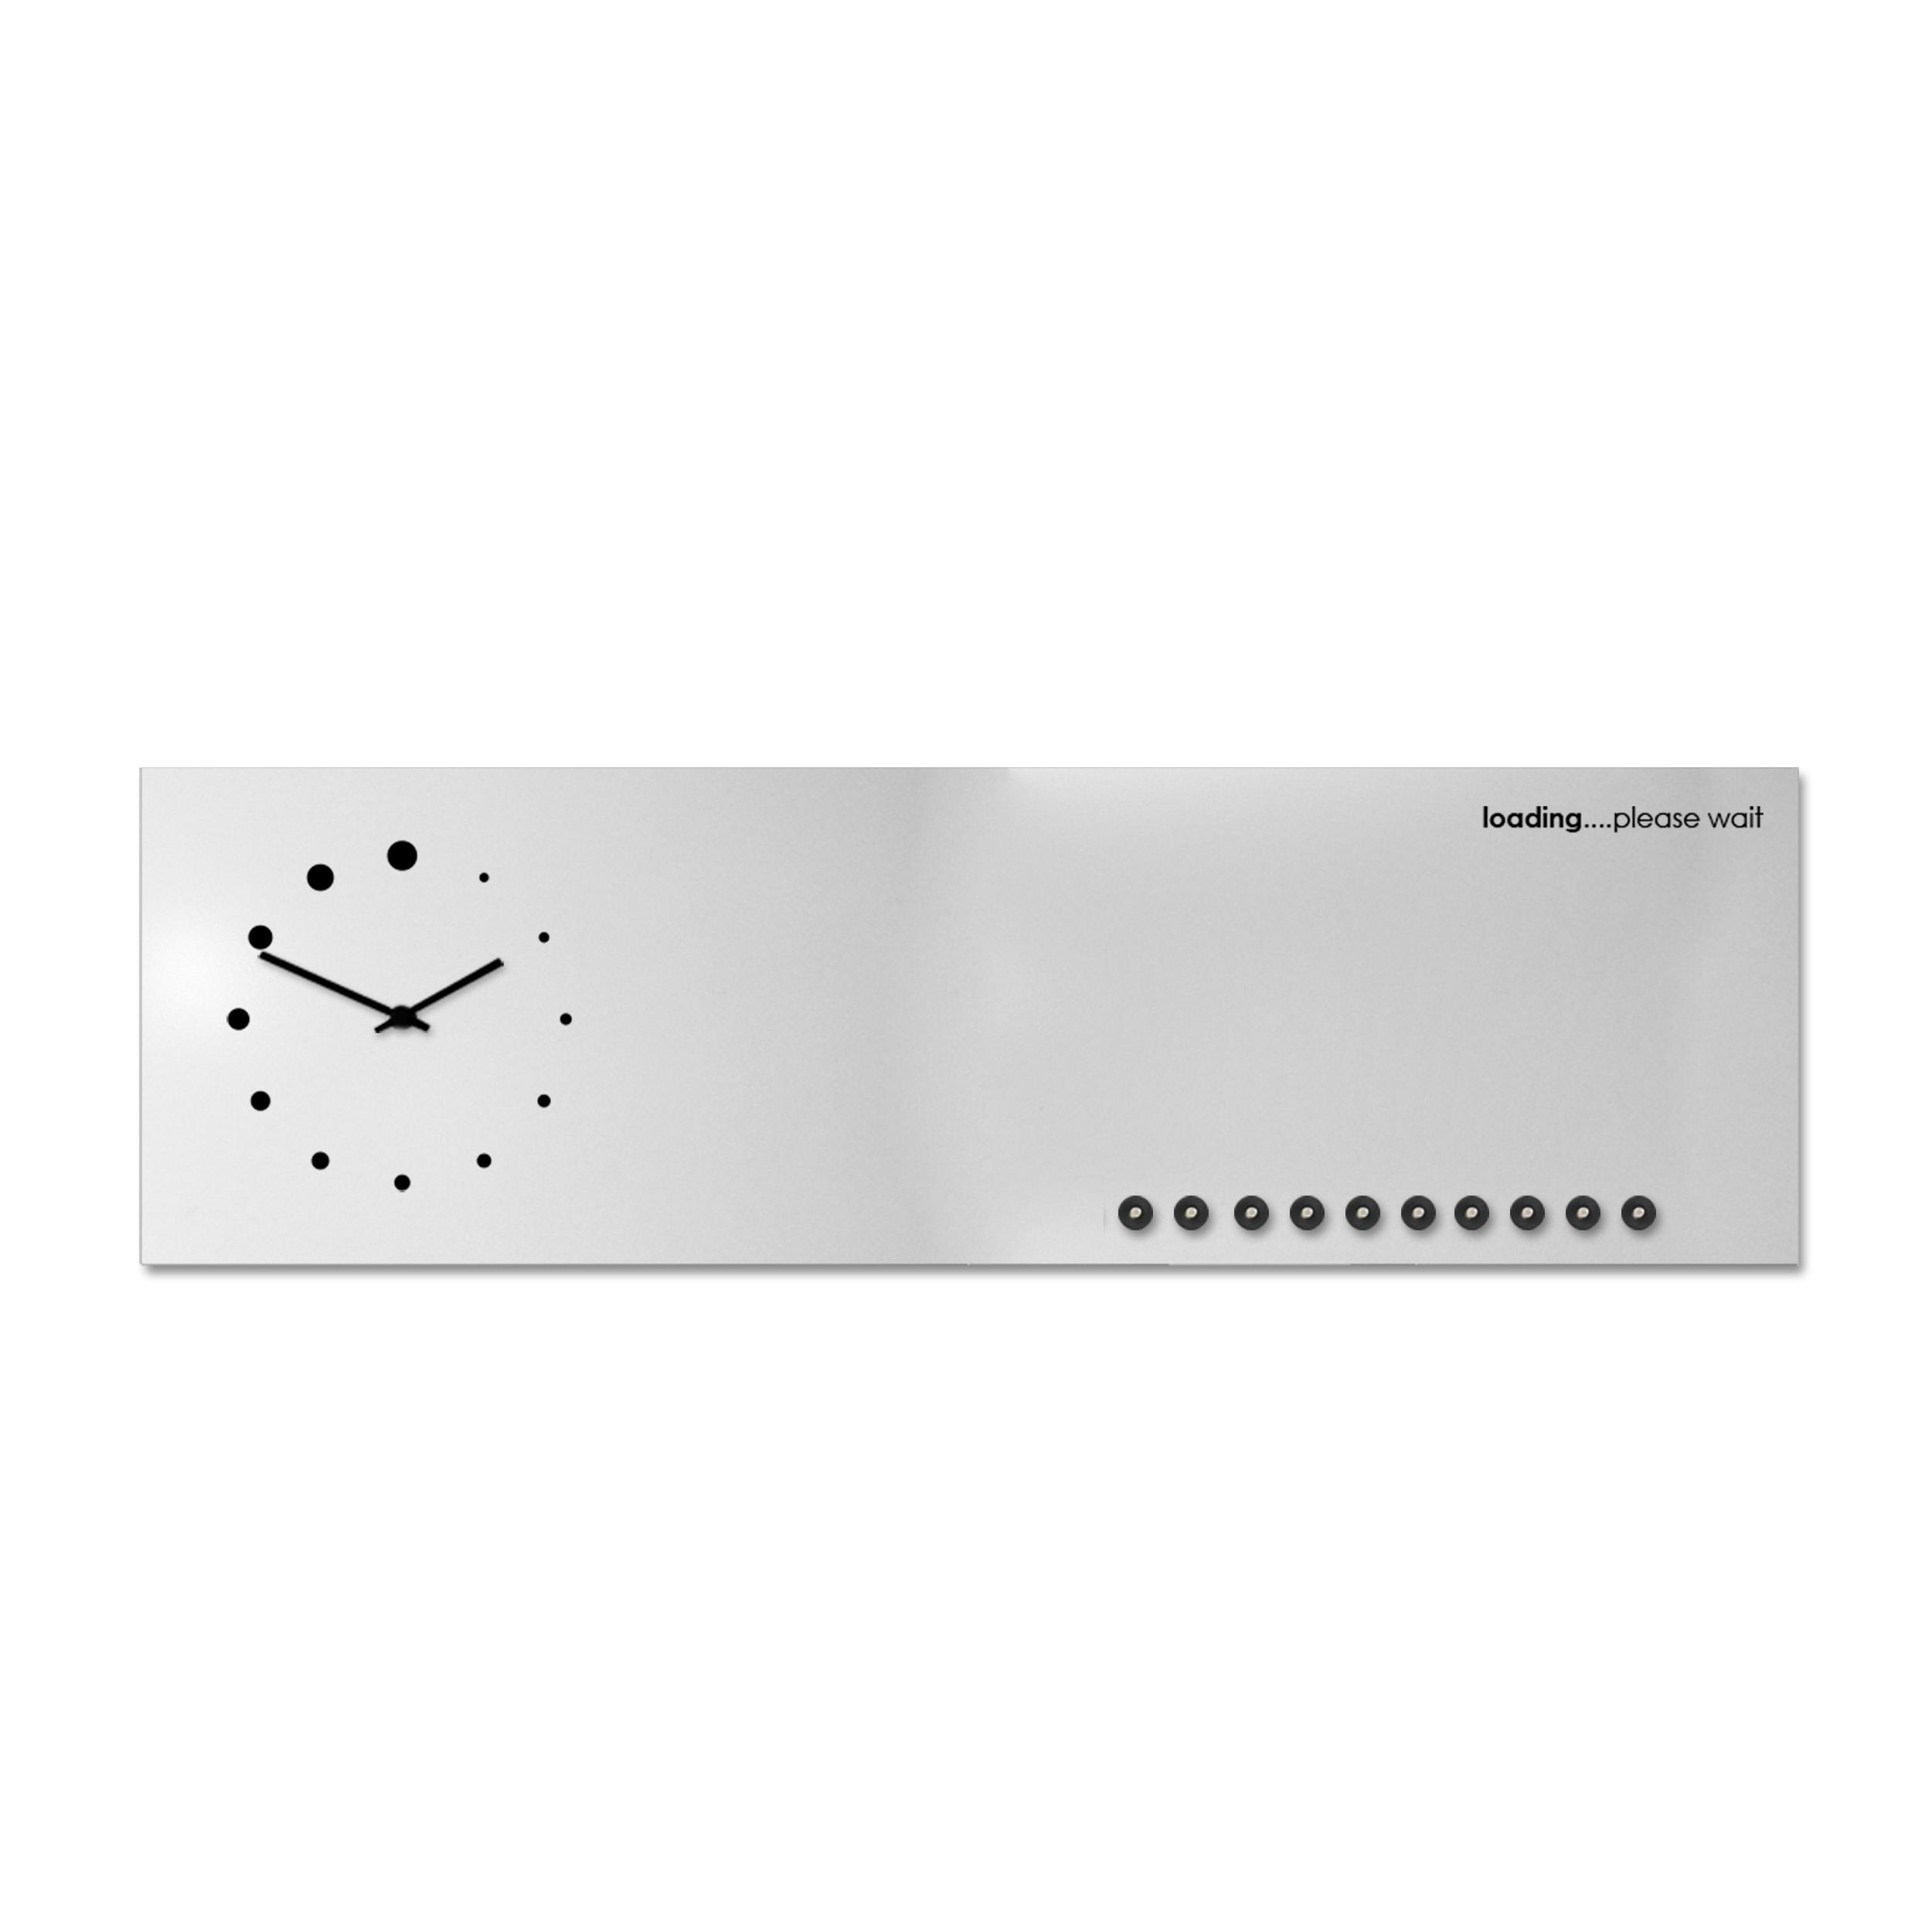 magnetic-board-design-loading-white-magnets-designobject